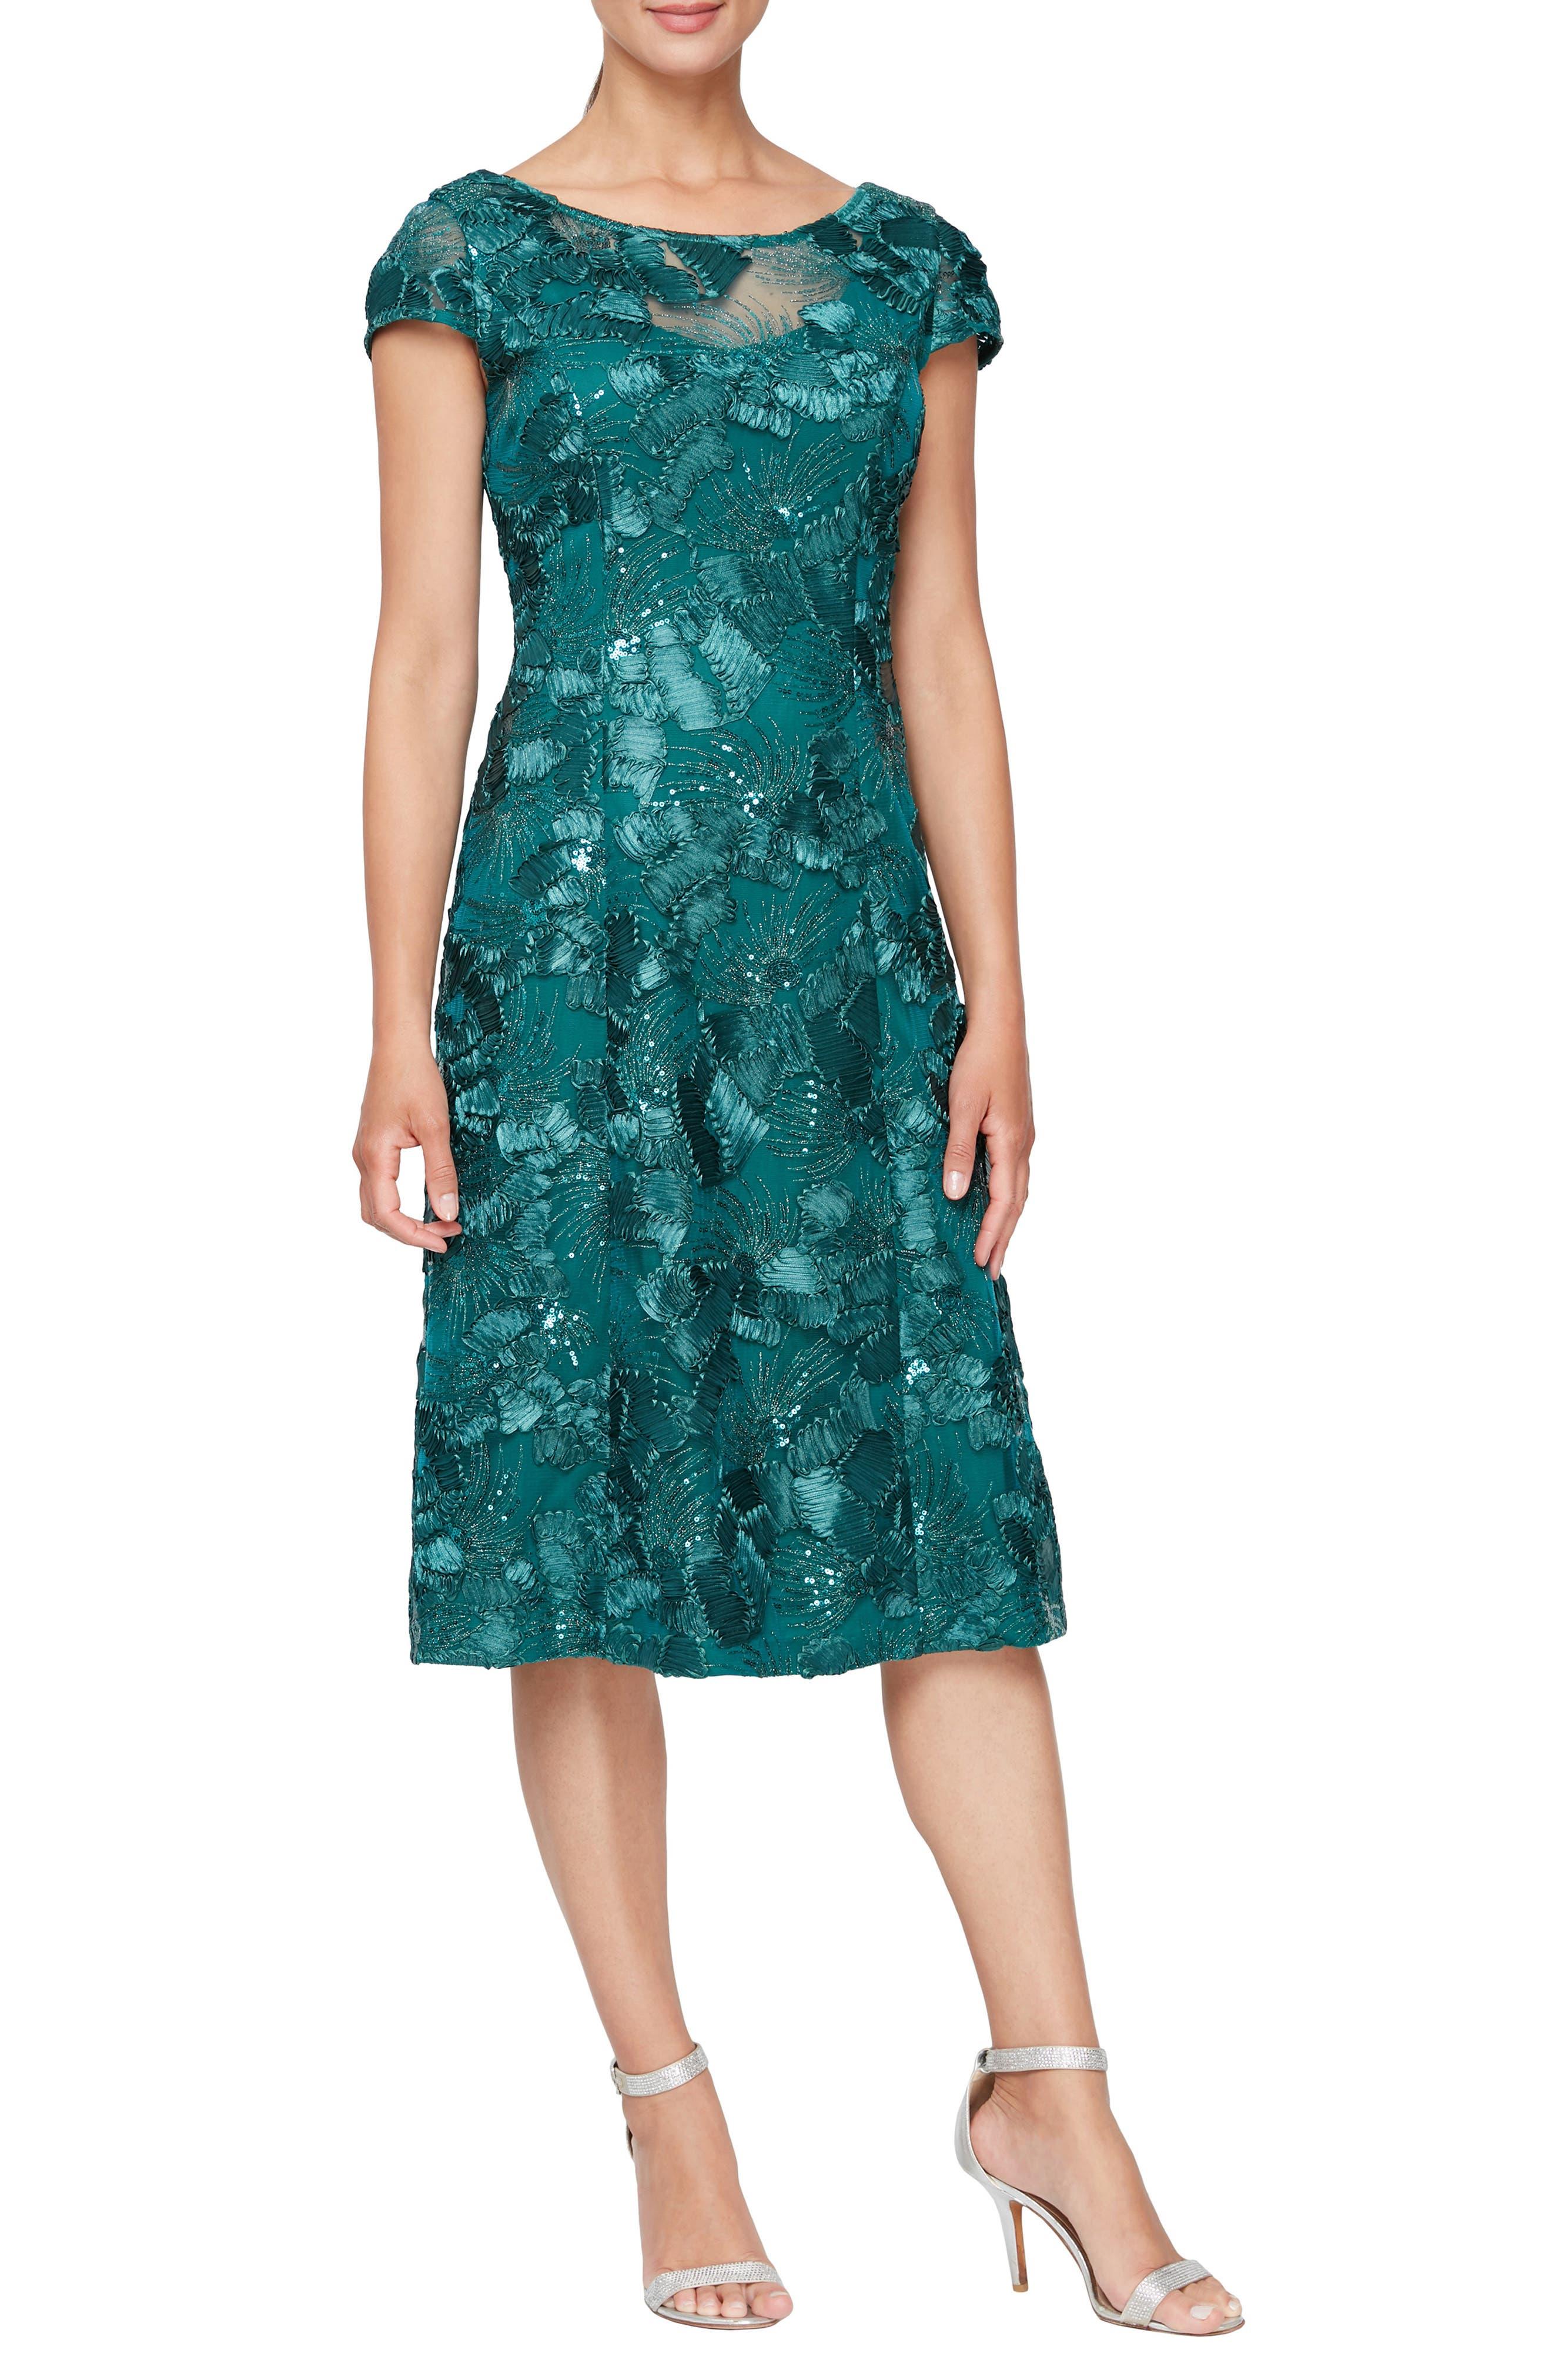 Sequin Floral Cocktail Dress